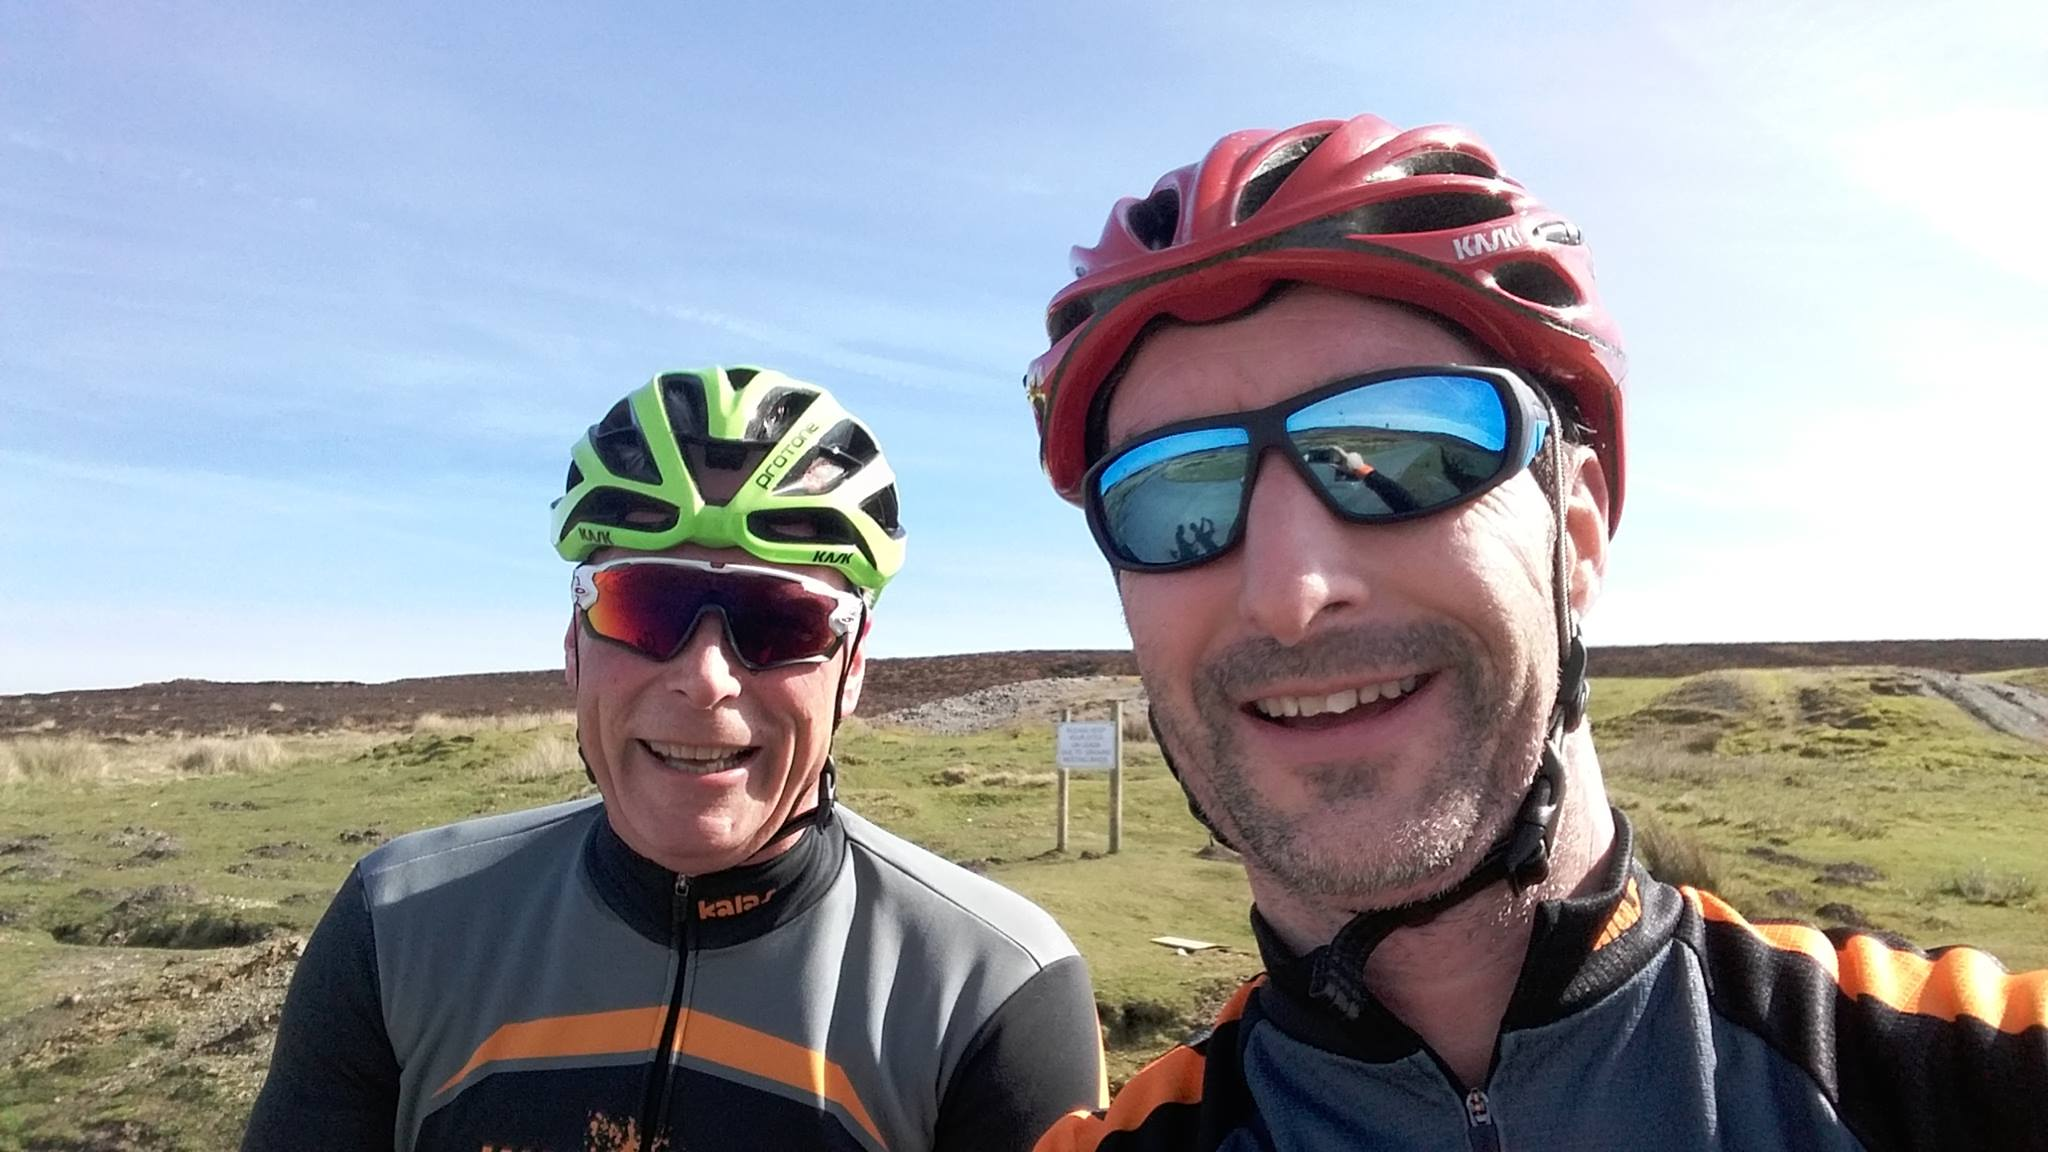 Gary and Ben enjoying a sunny ride